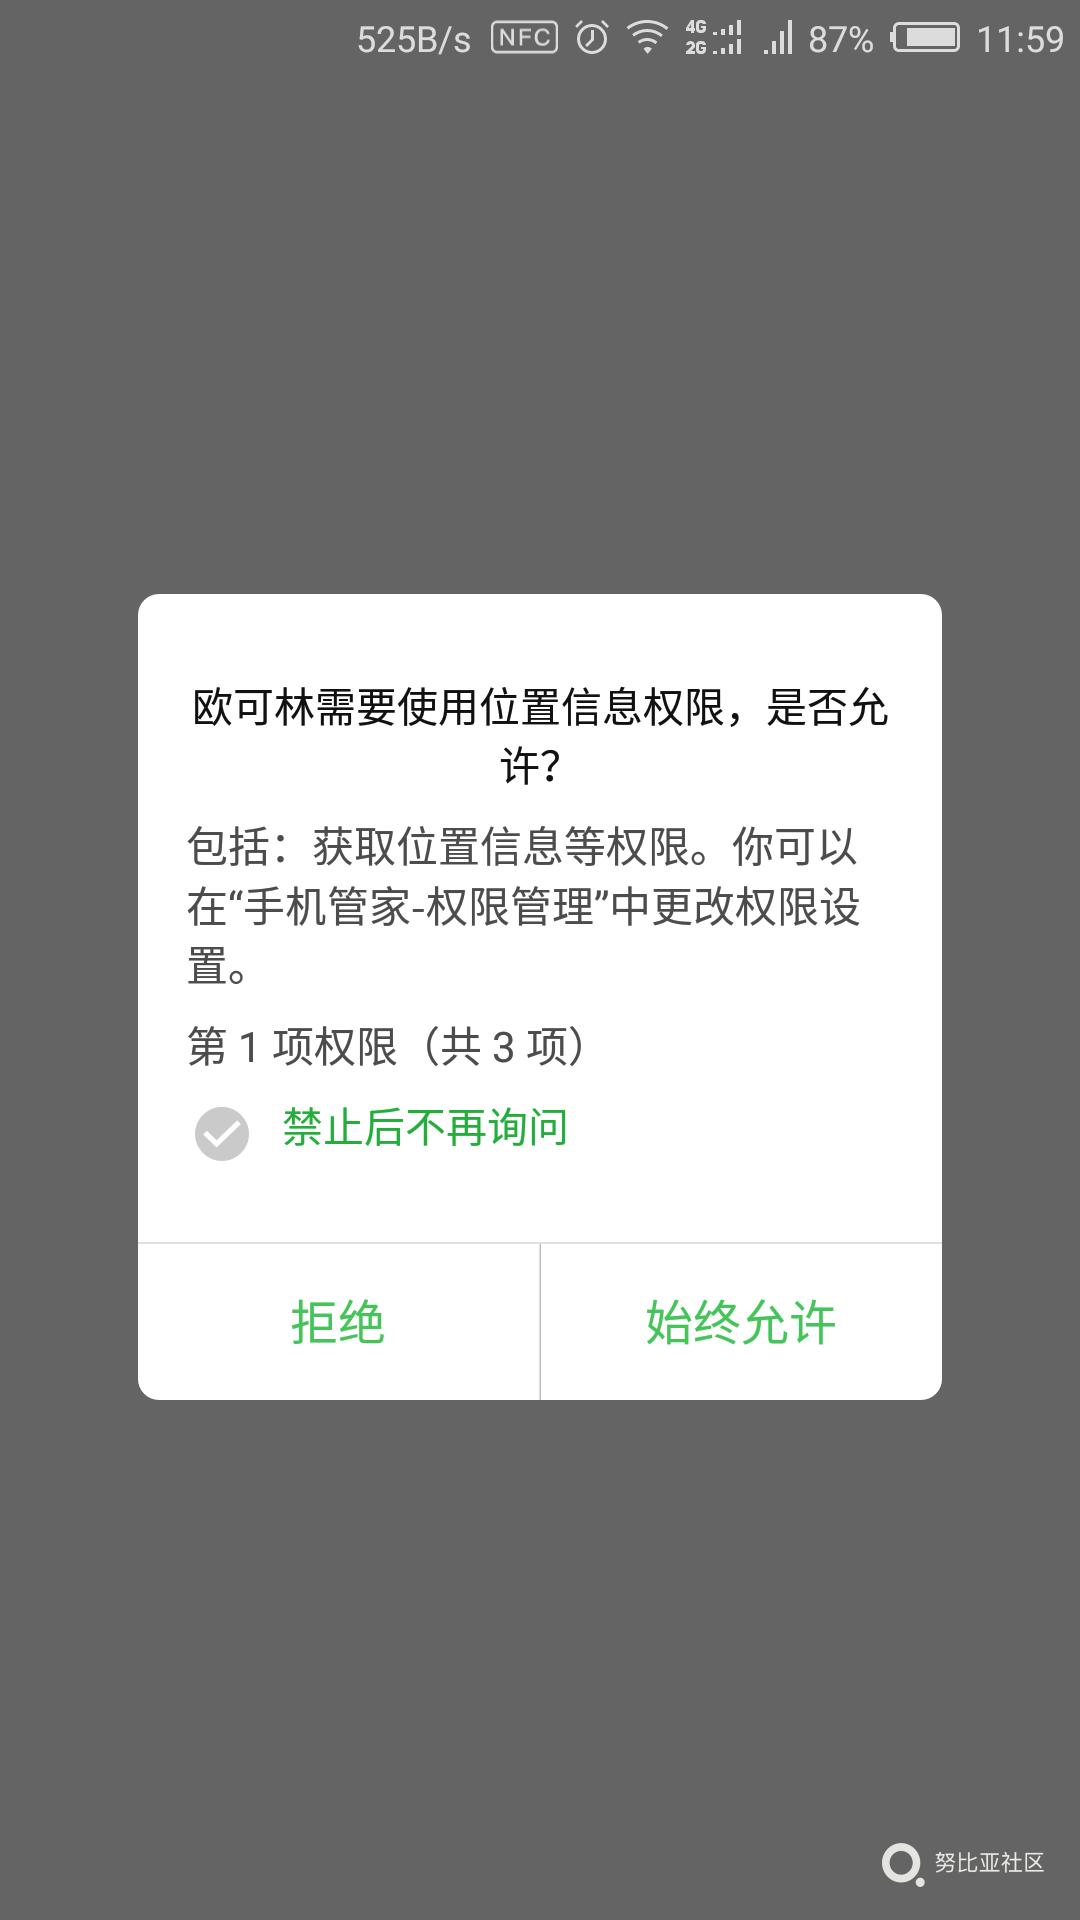 Screenshot_2018-01-07-11-59-17.png